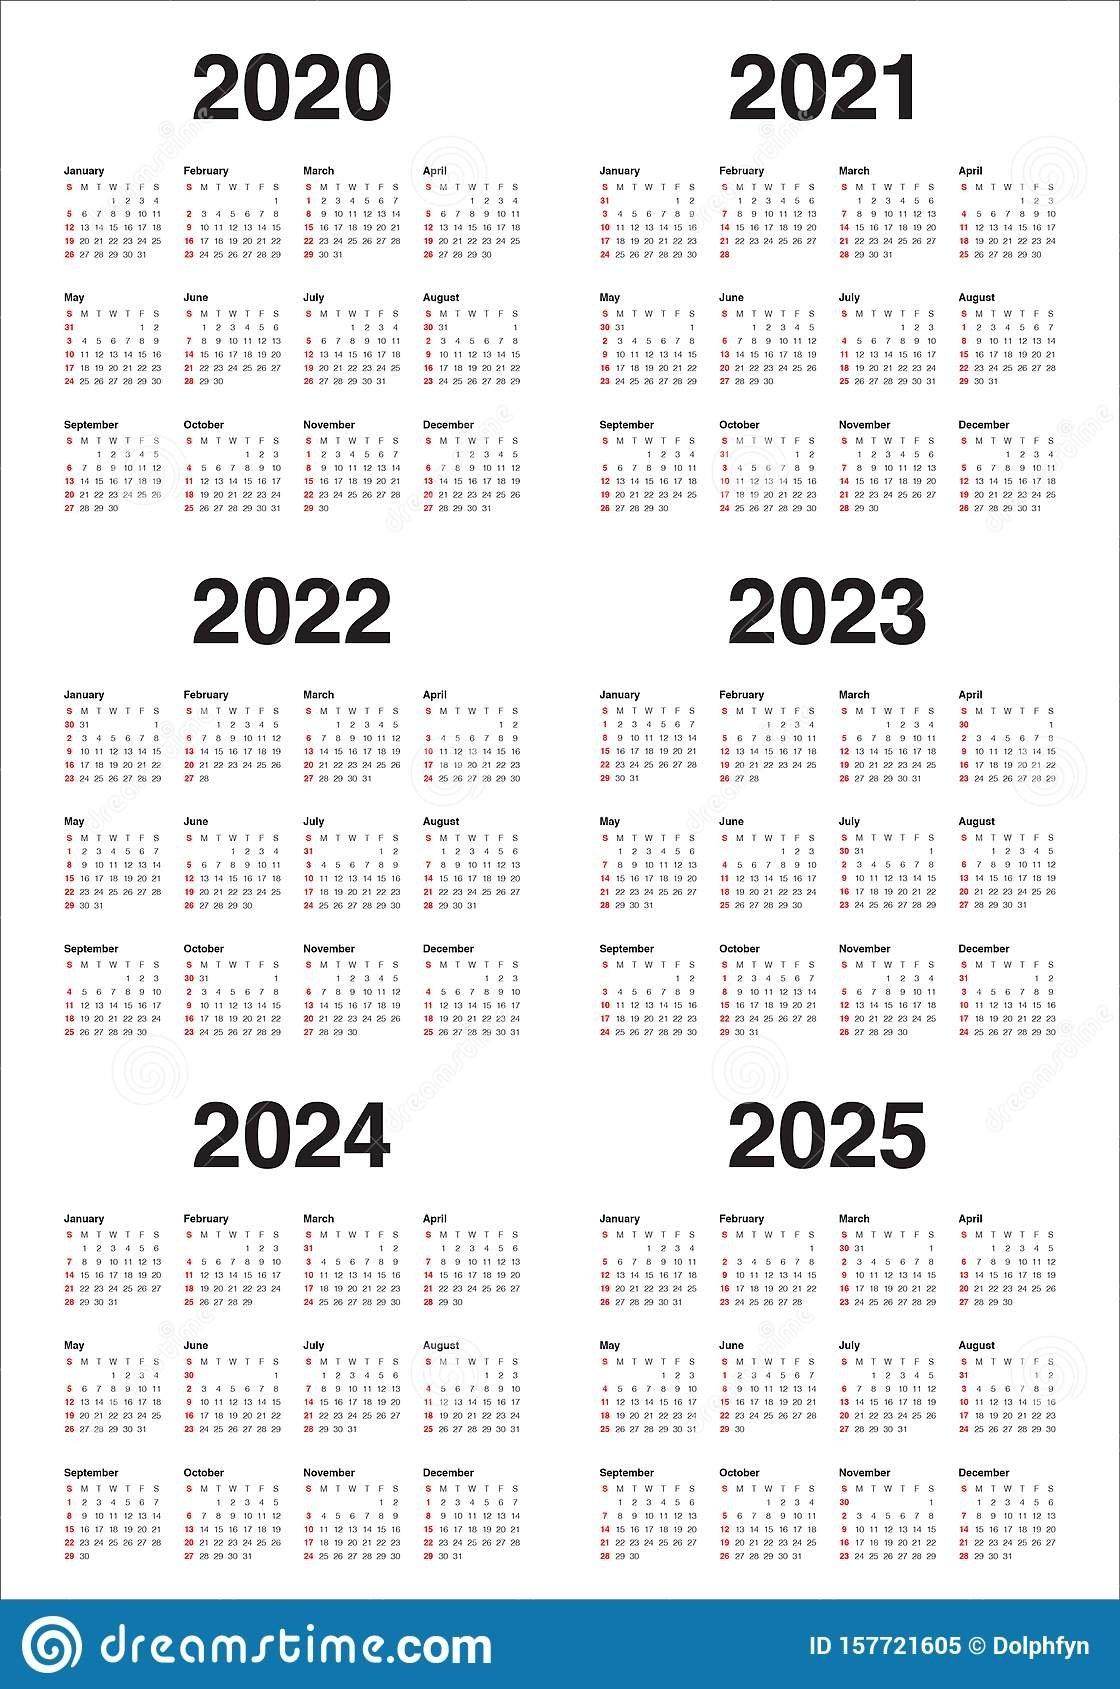 Three Year Printable Calendar 2021 To 2023 | Calendar Printables Free Blank for 3 Year Calendar 2021 2021 2022 Graphics